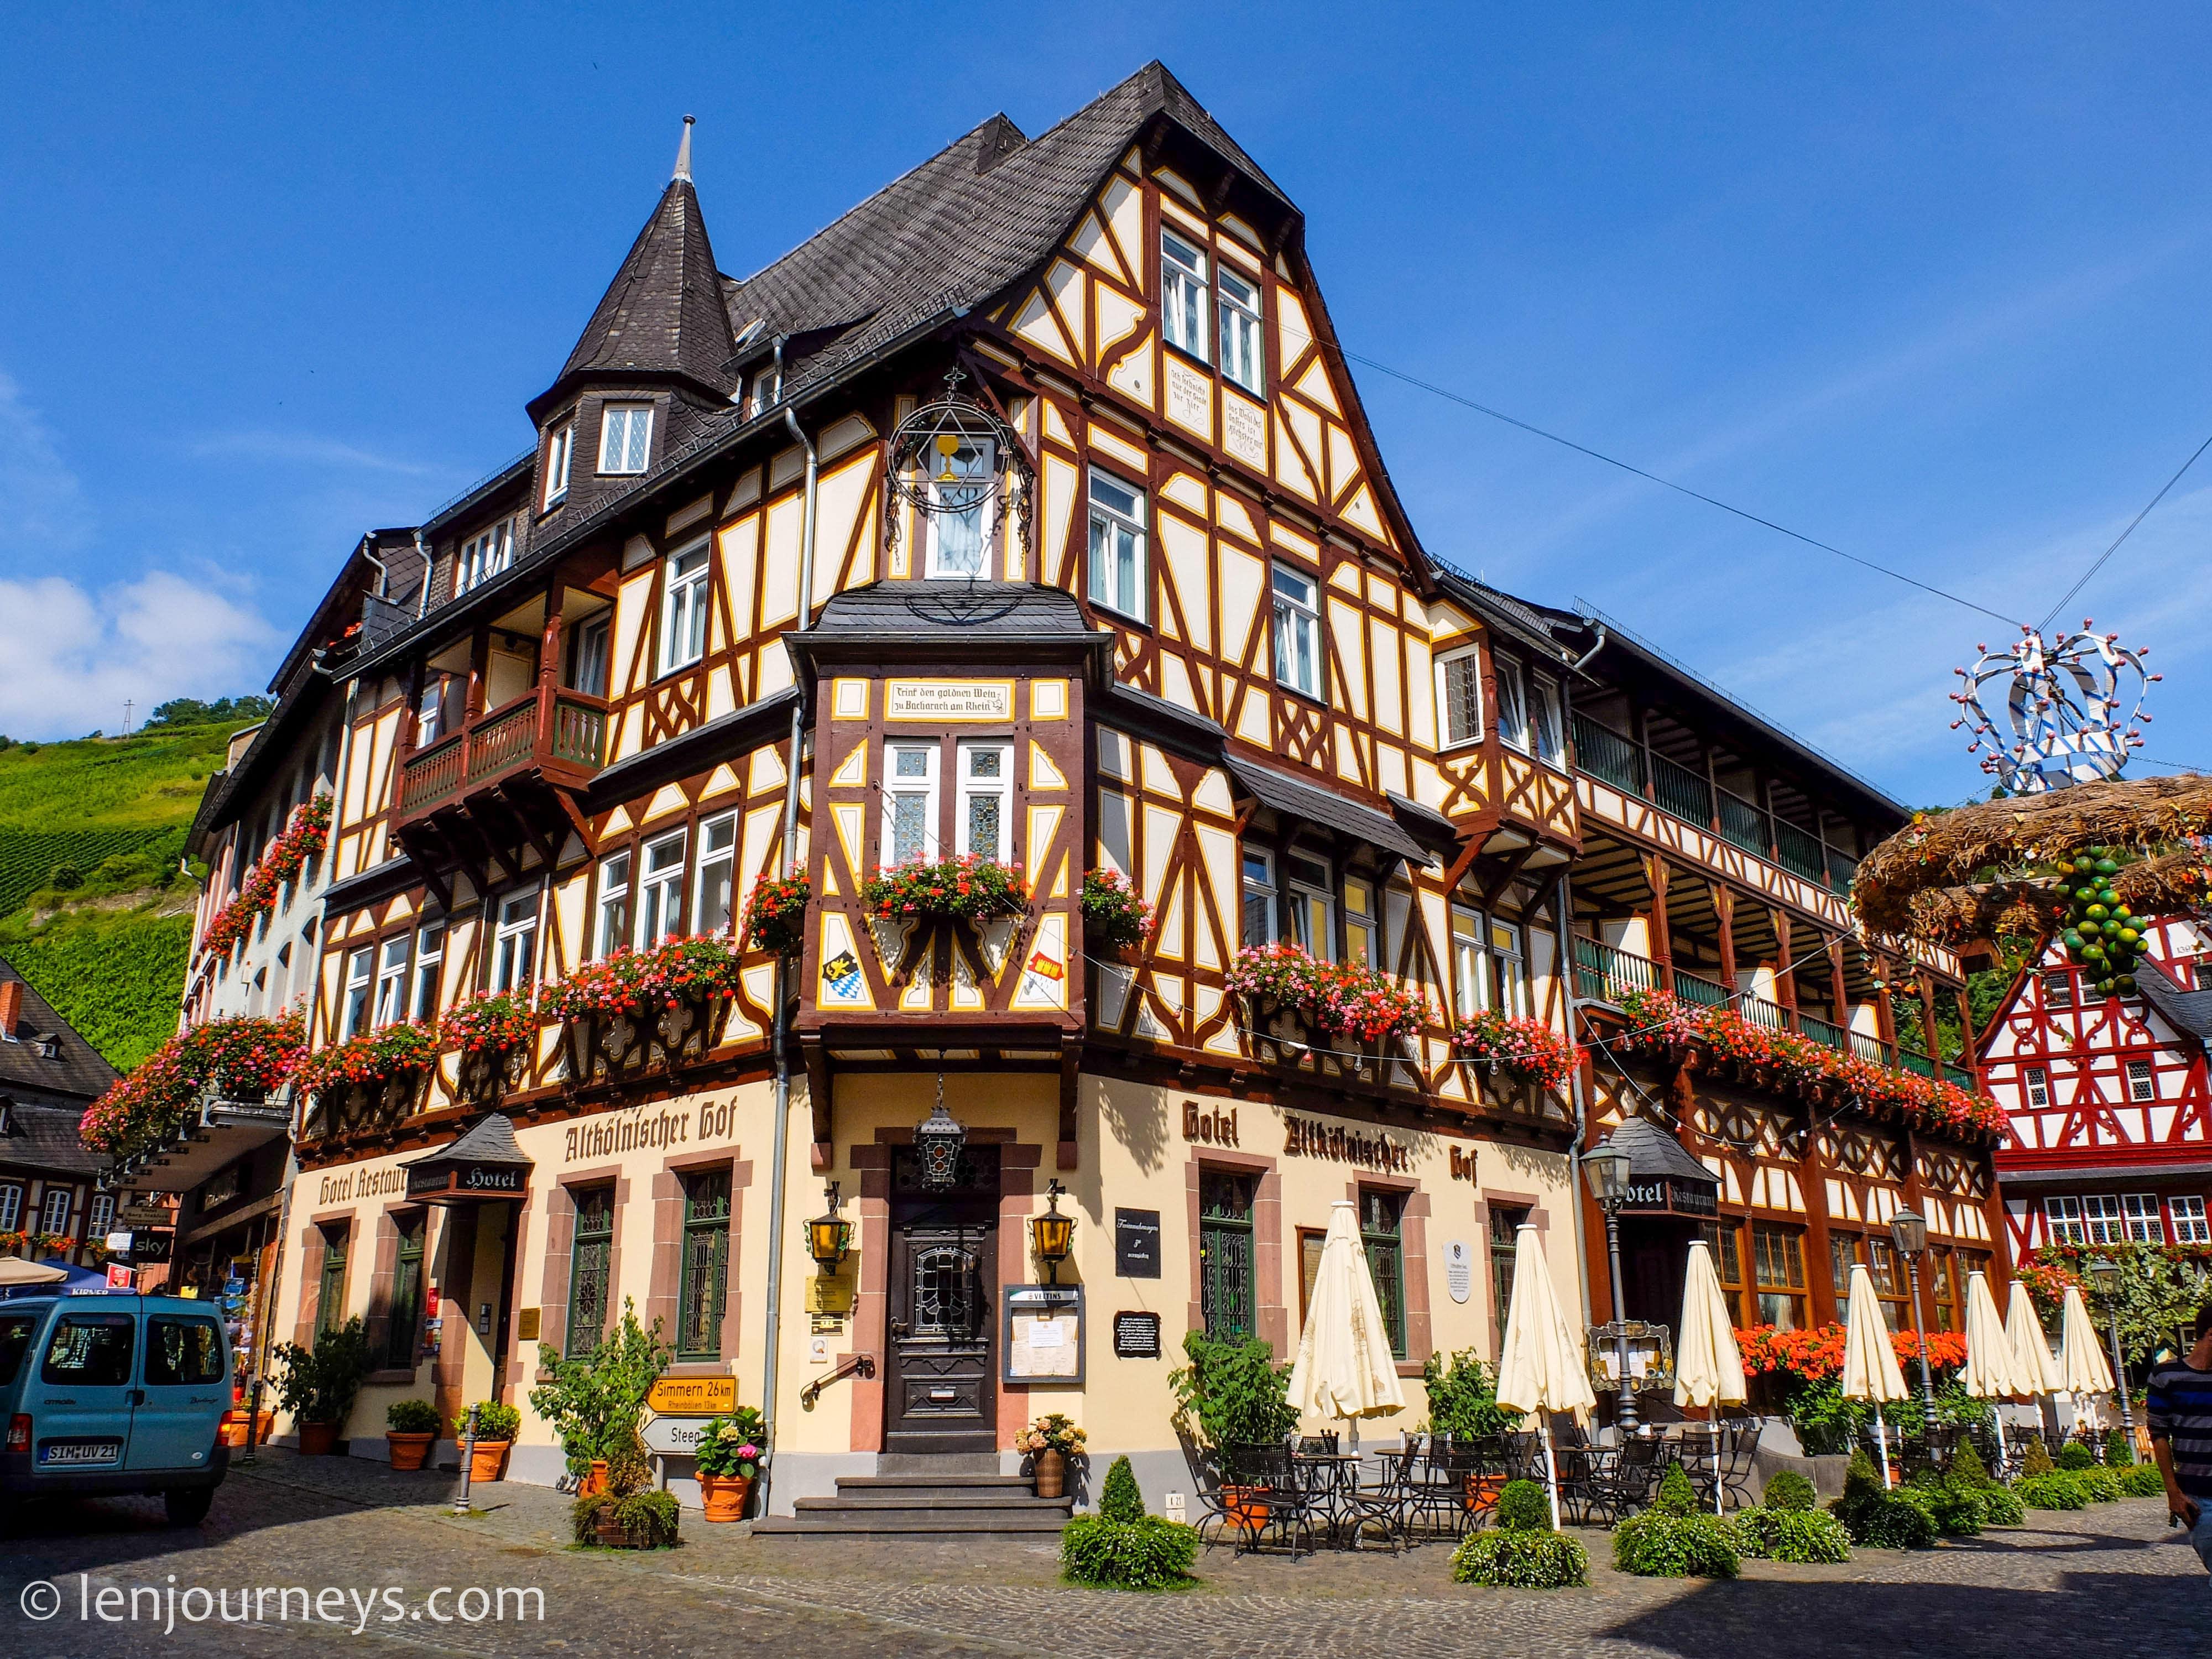 Half-timbered house in Bacharach, Rhineland